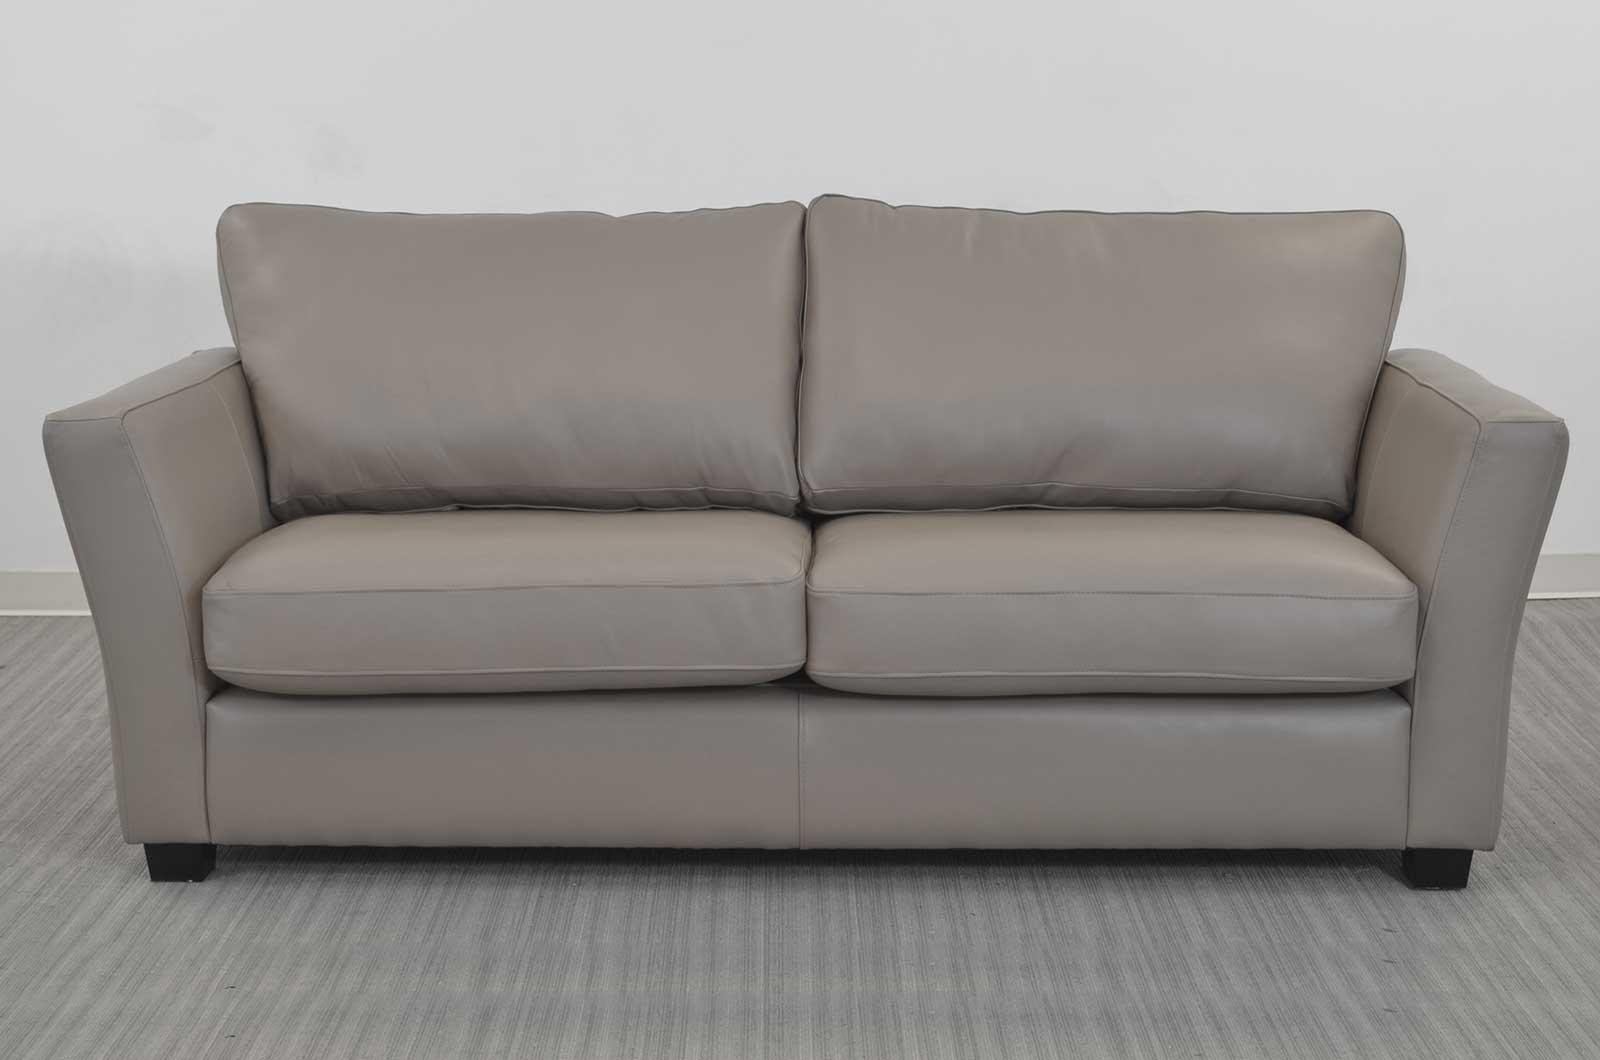 Elegant Two Cushion Sofa